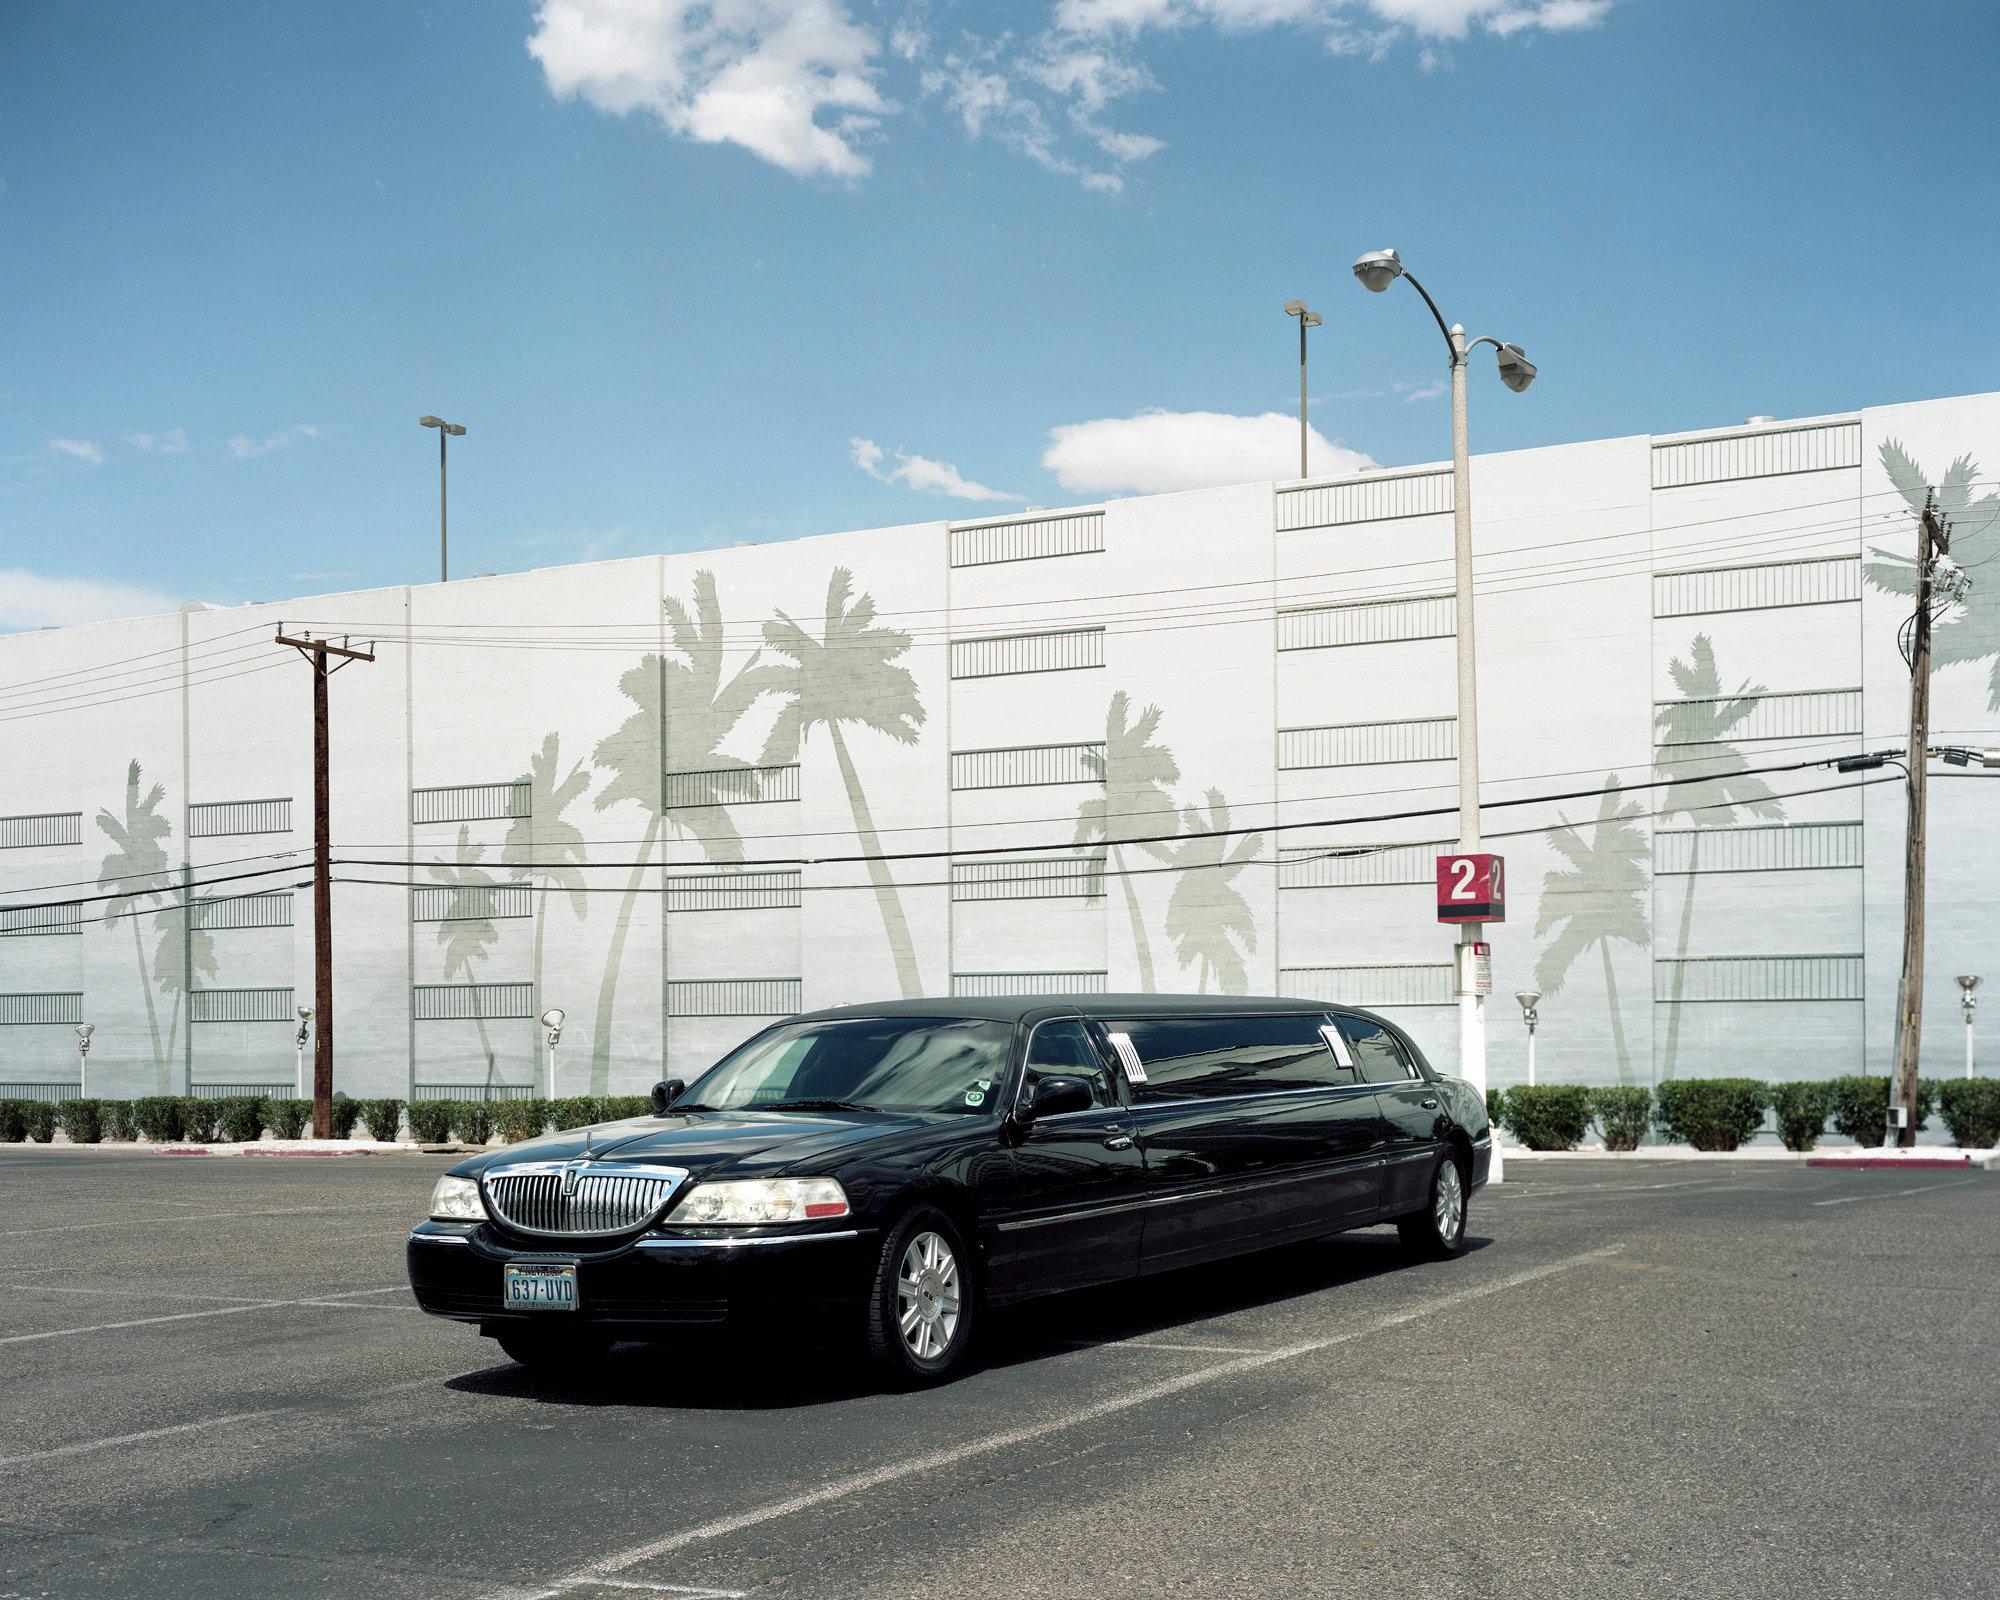 Vegas_05.jpg